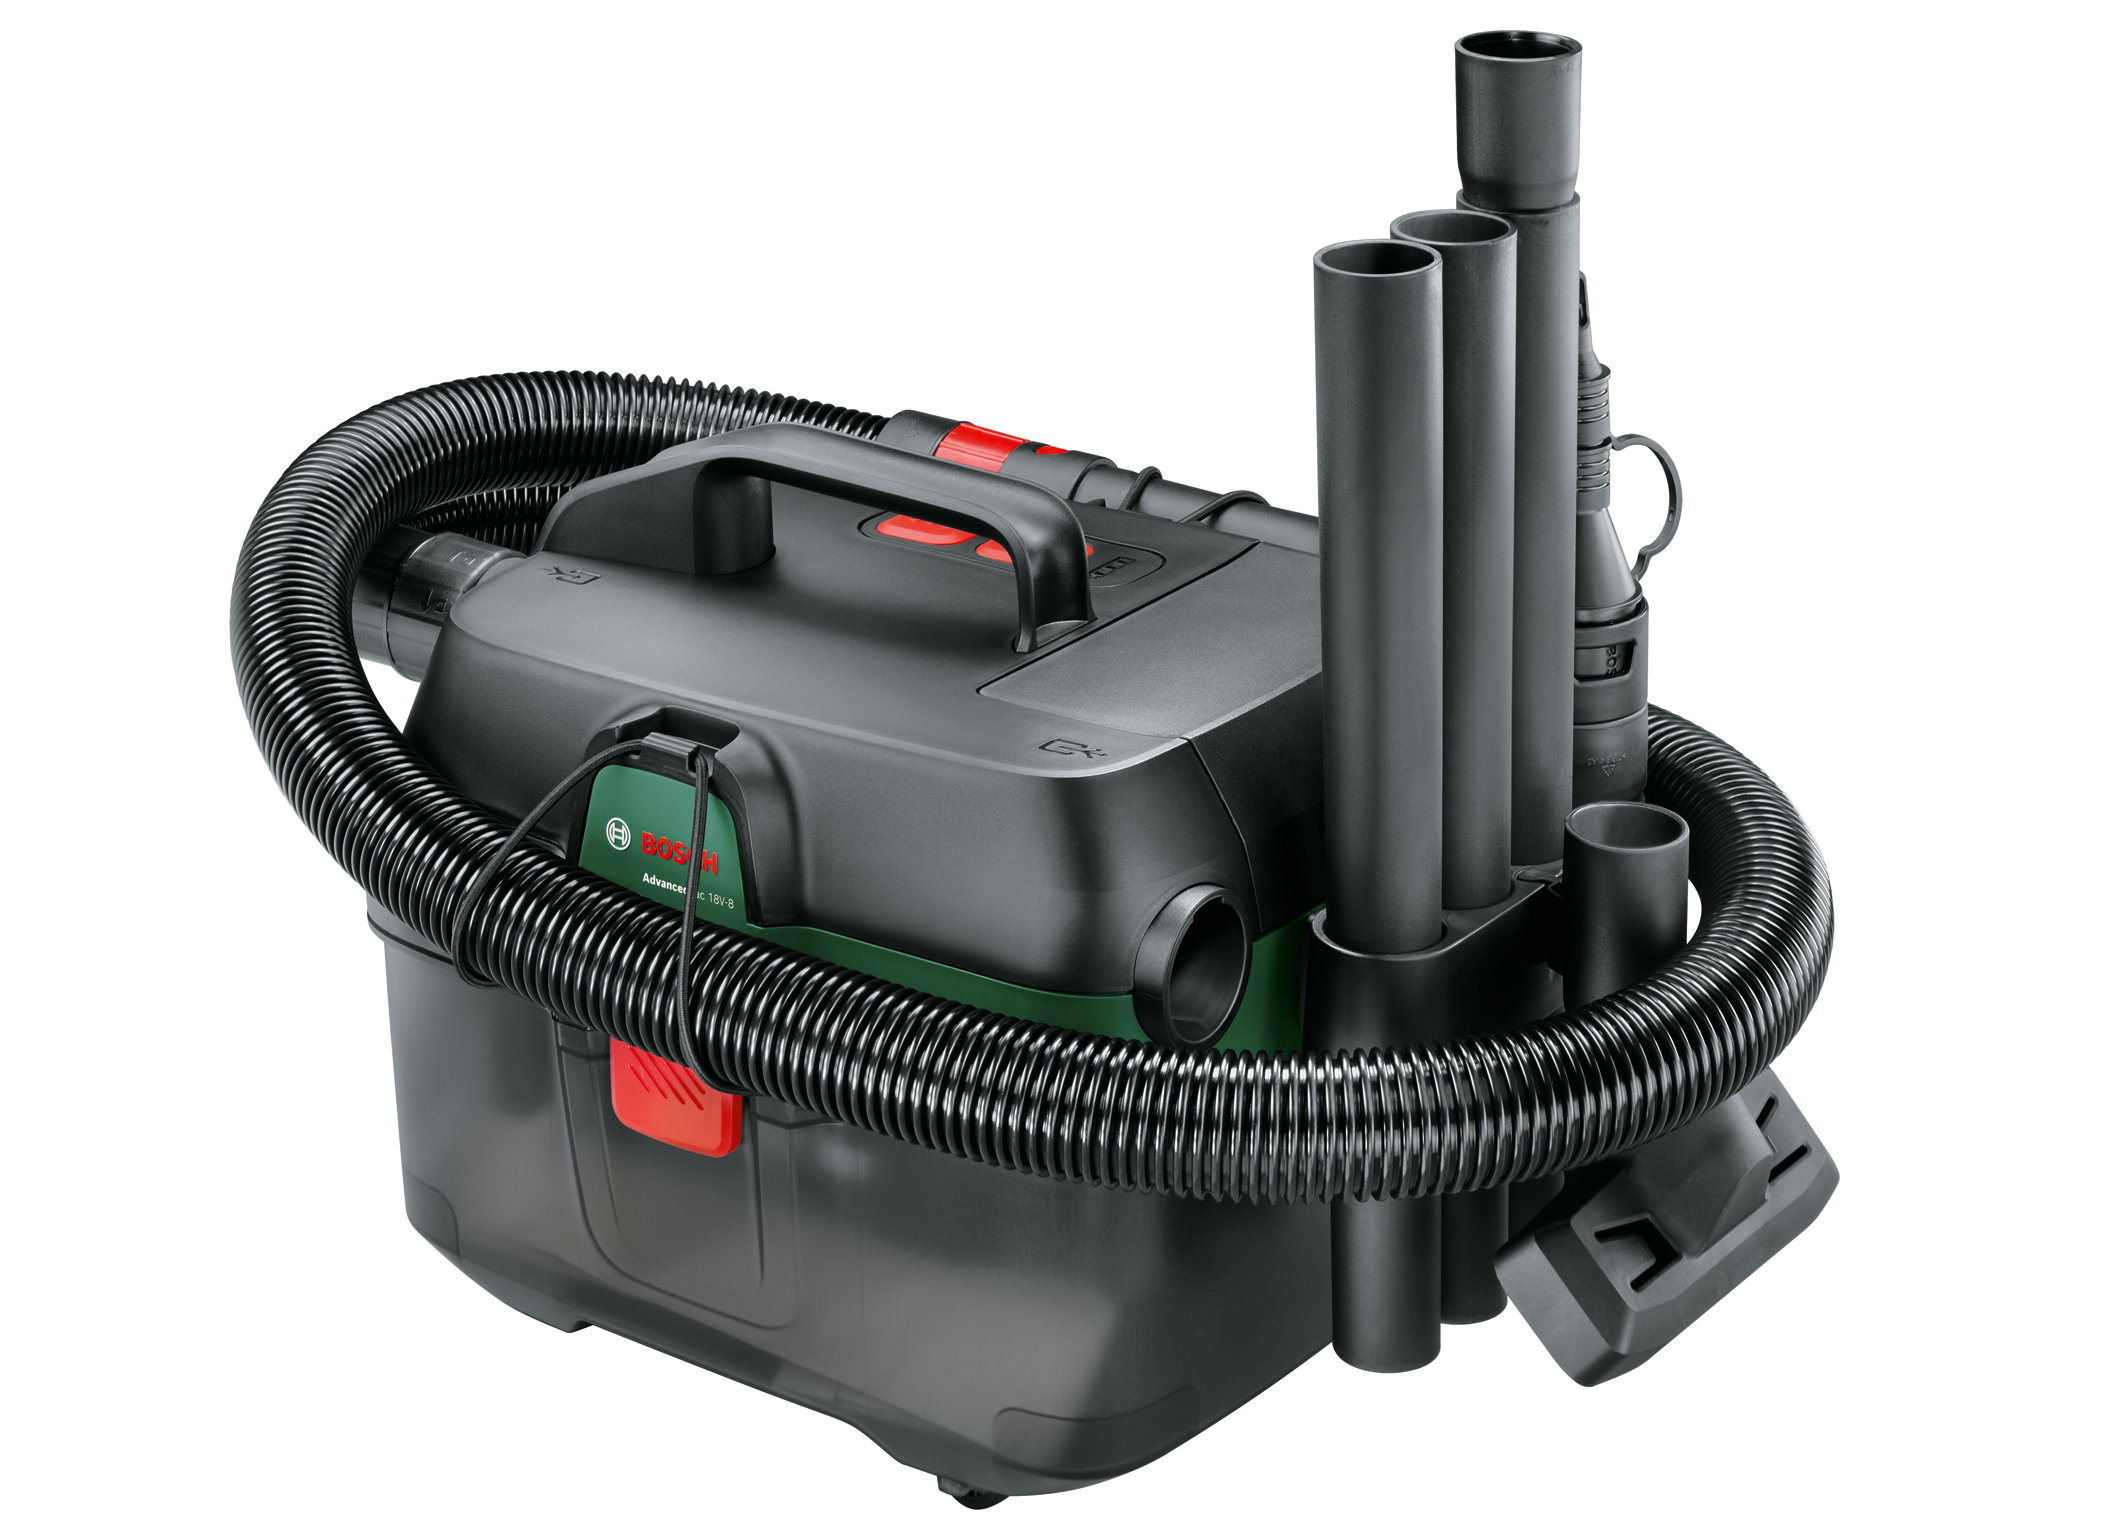 Erster Akku-Nass-/Trockensauger im Heimwerker-Sortiment: Mobiles 3-in-1-Multitalent AdvancedVac 18V-8 von Bosch